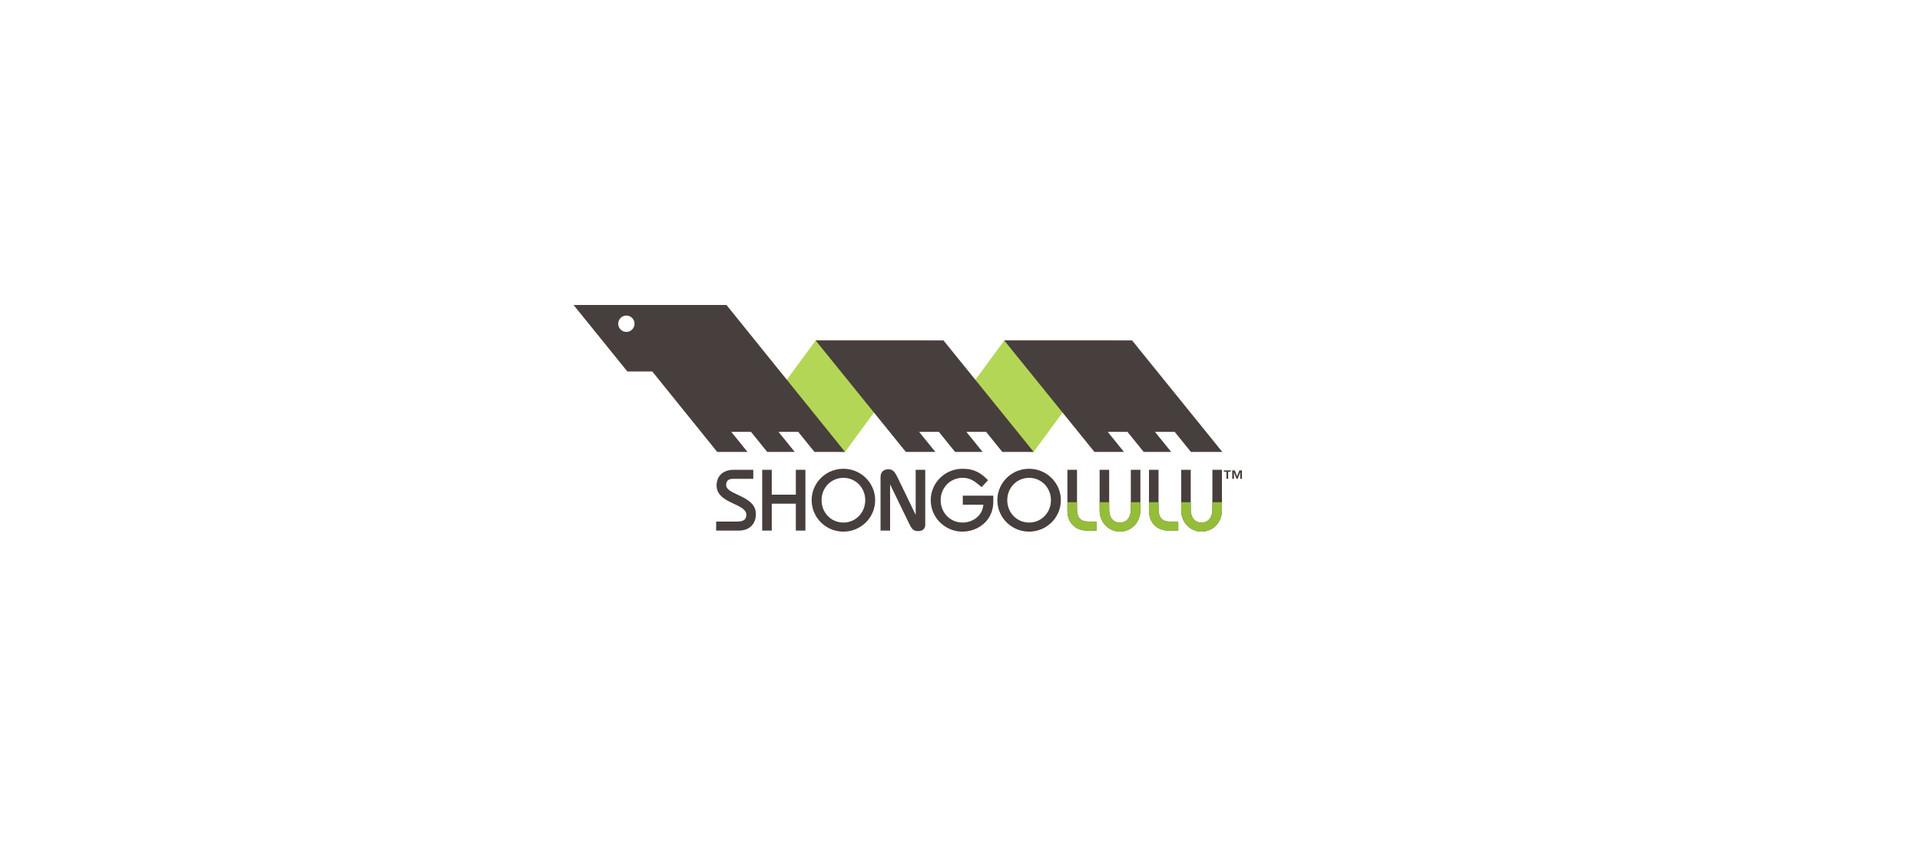 shongolulu_01.jpg